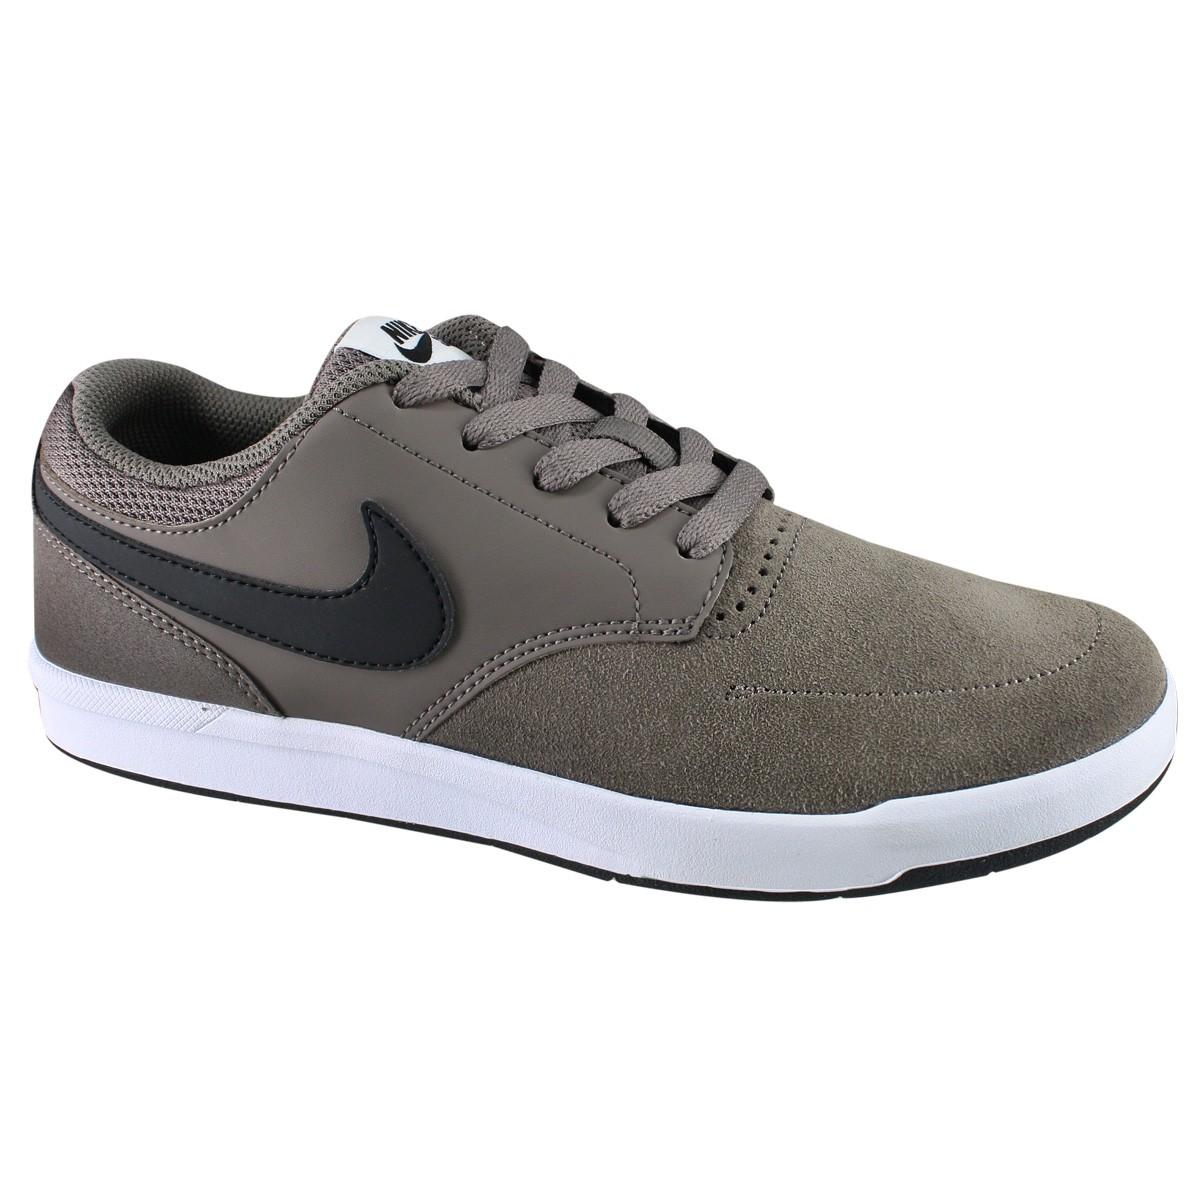 5b348401970 Tenis Nike SB Fokus 749477 201 - Bege - Calçados Online Sandálias ...